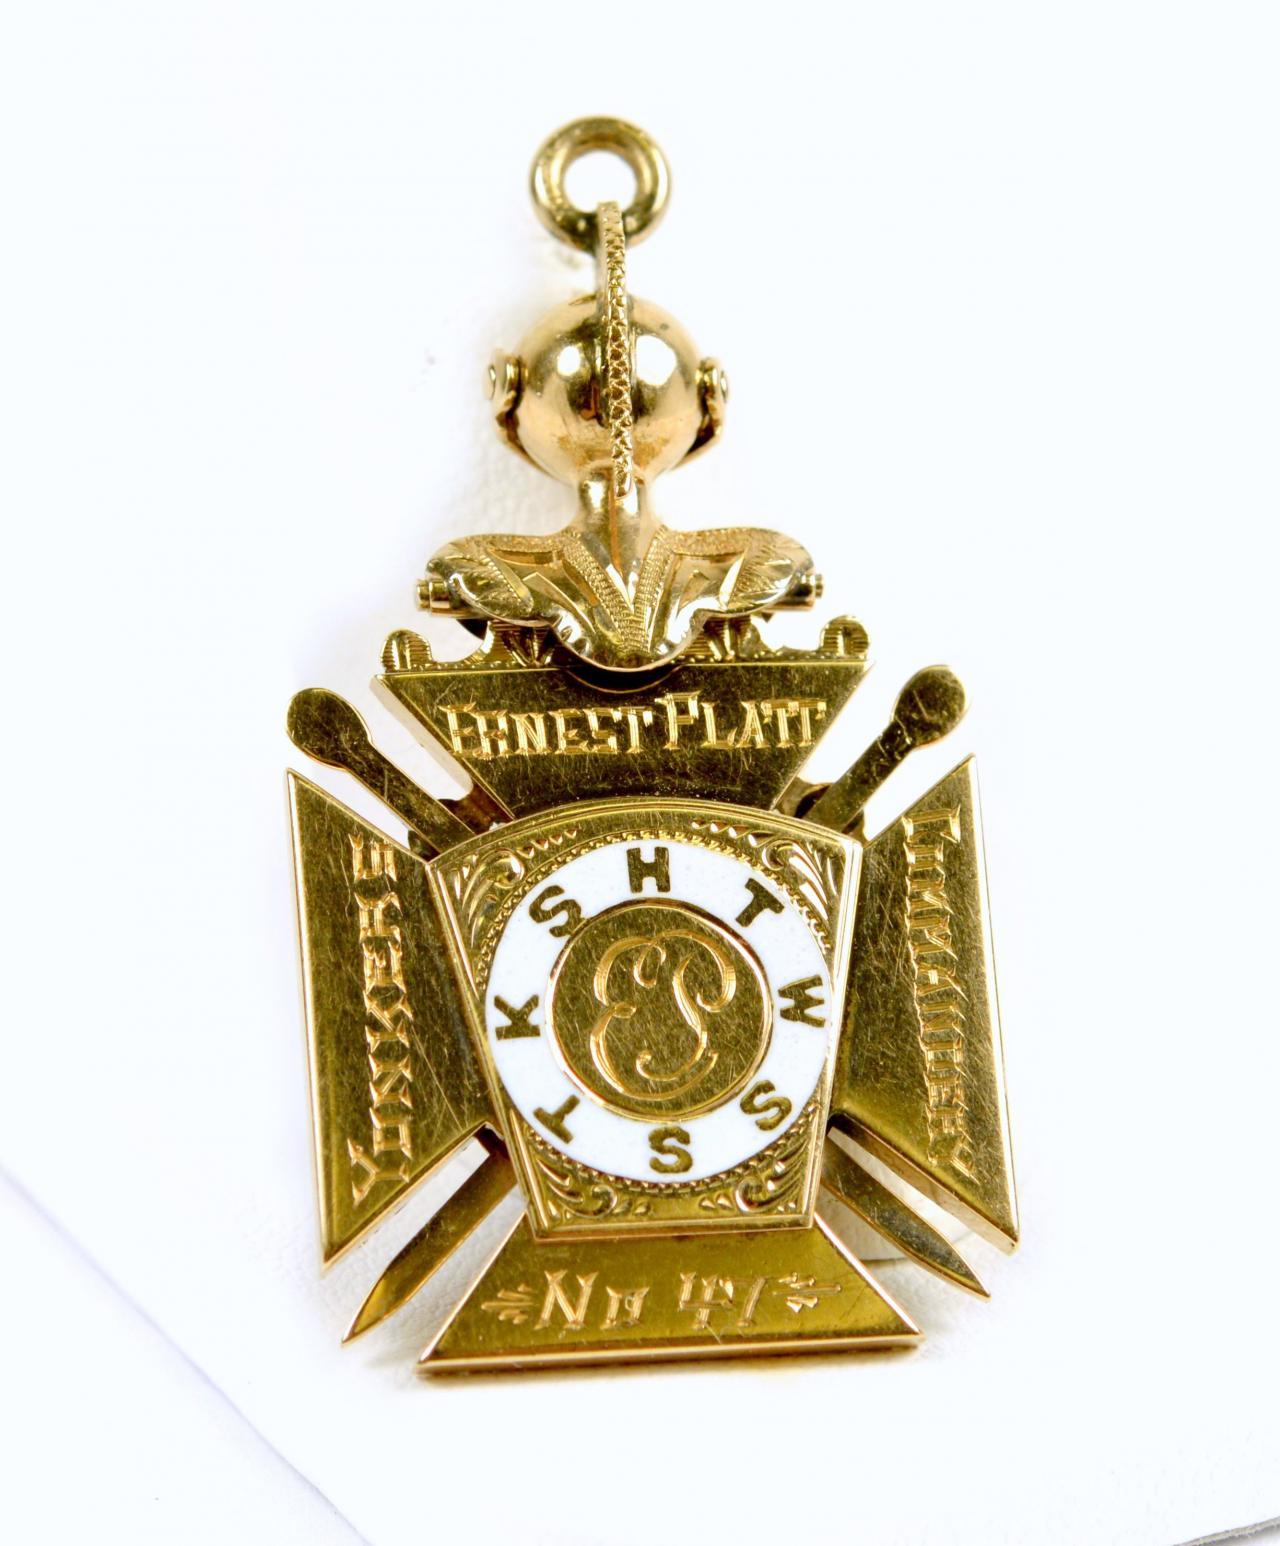 Antique 14k Gold Masonic Knights Templar In Hoc Signo